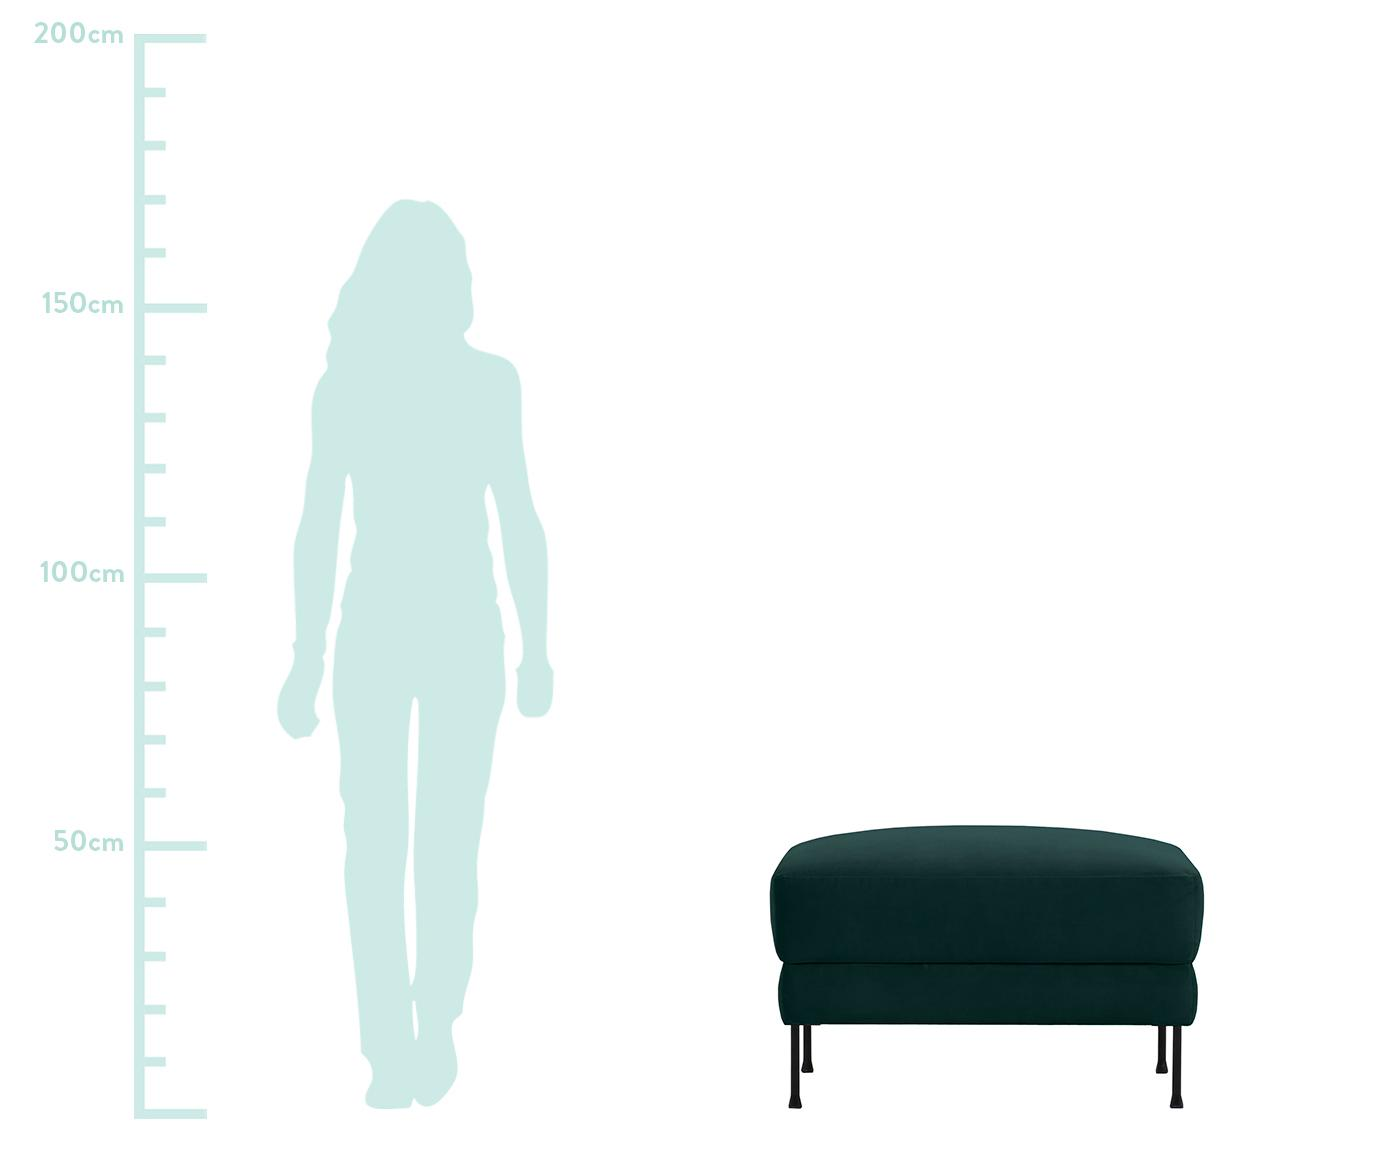 Sofa-Hocker Fluente aus Samt, Bezug: Samt (Hochwertiger Polyes, Gestell: Sperrholz, Spanplatte, Füße: Metall, pulverbeschichtet, Samt Dunkelgrün, 62 x 46 cm